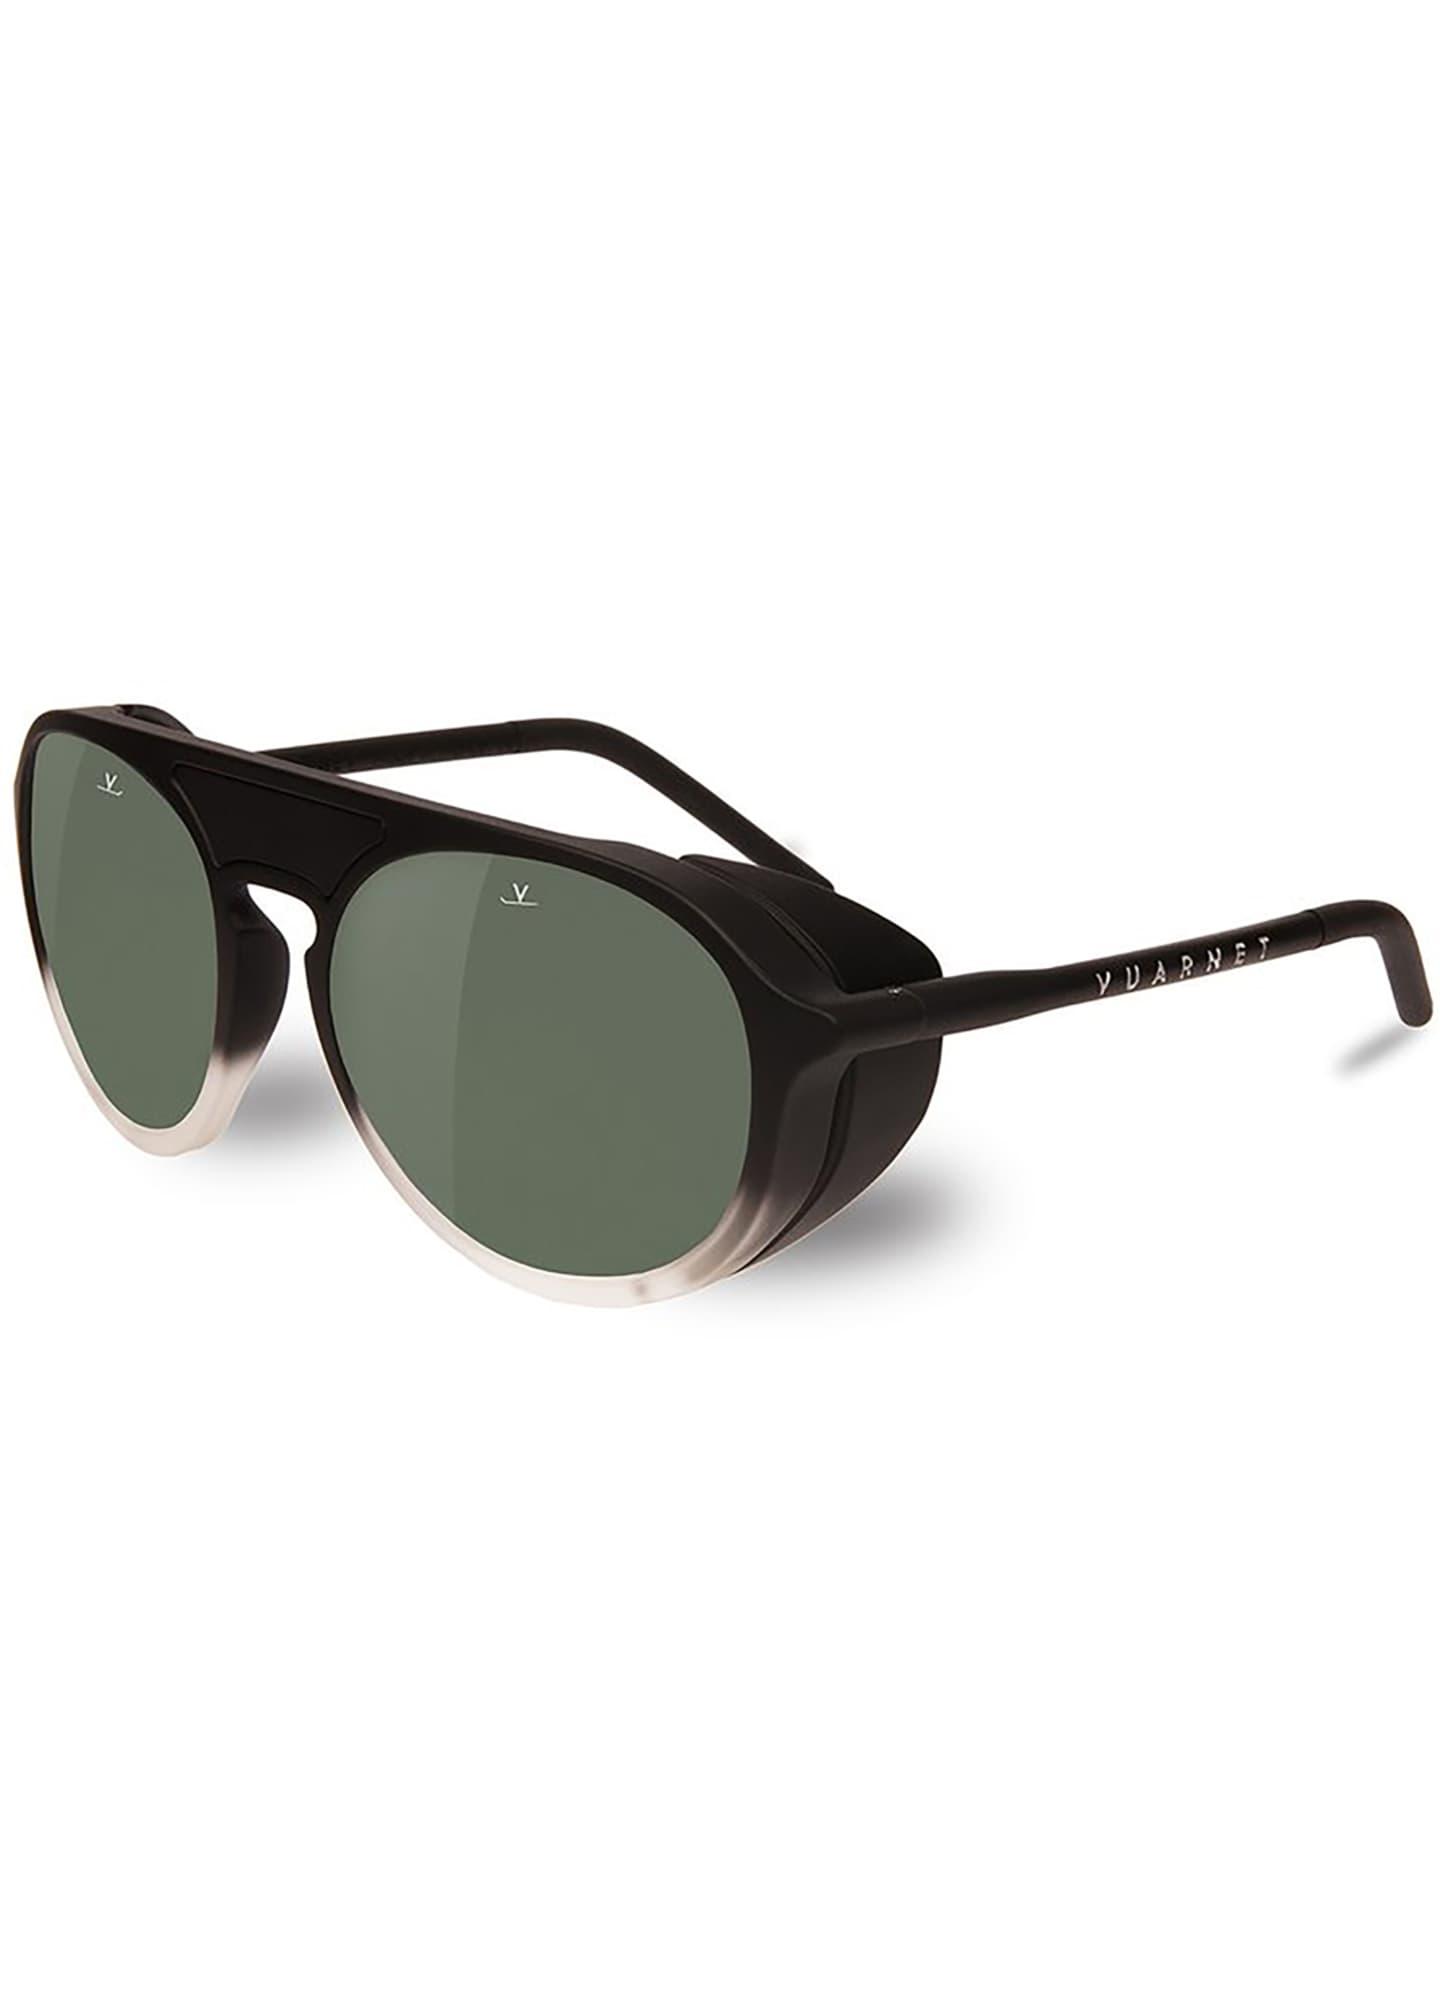 Vuarnet Men's Active Ice Round Nylon Sunglasses